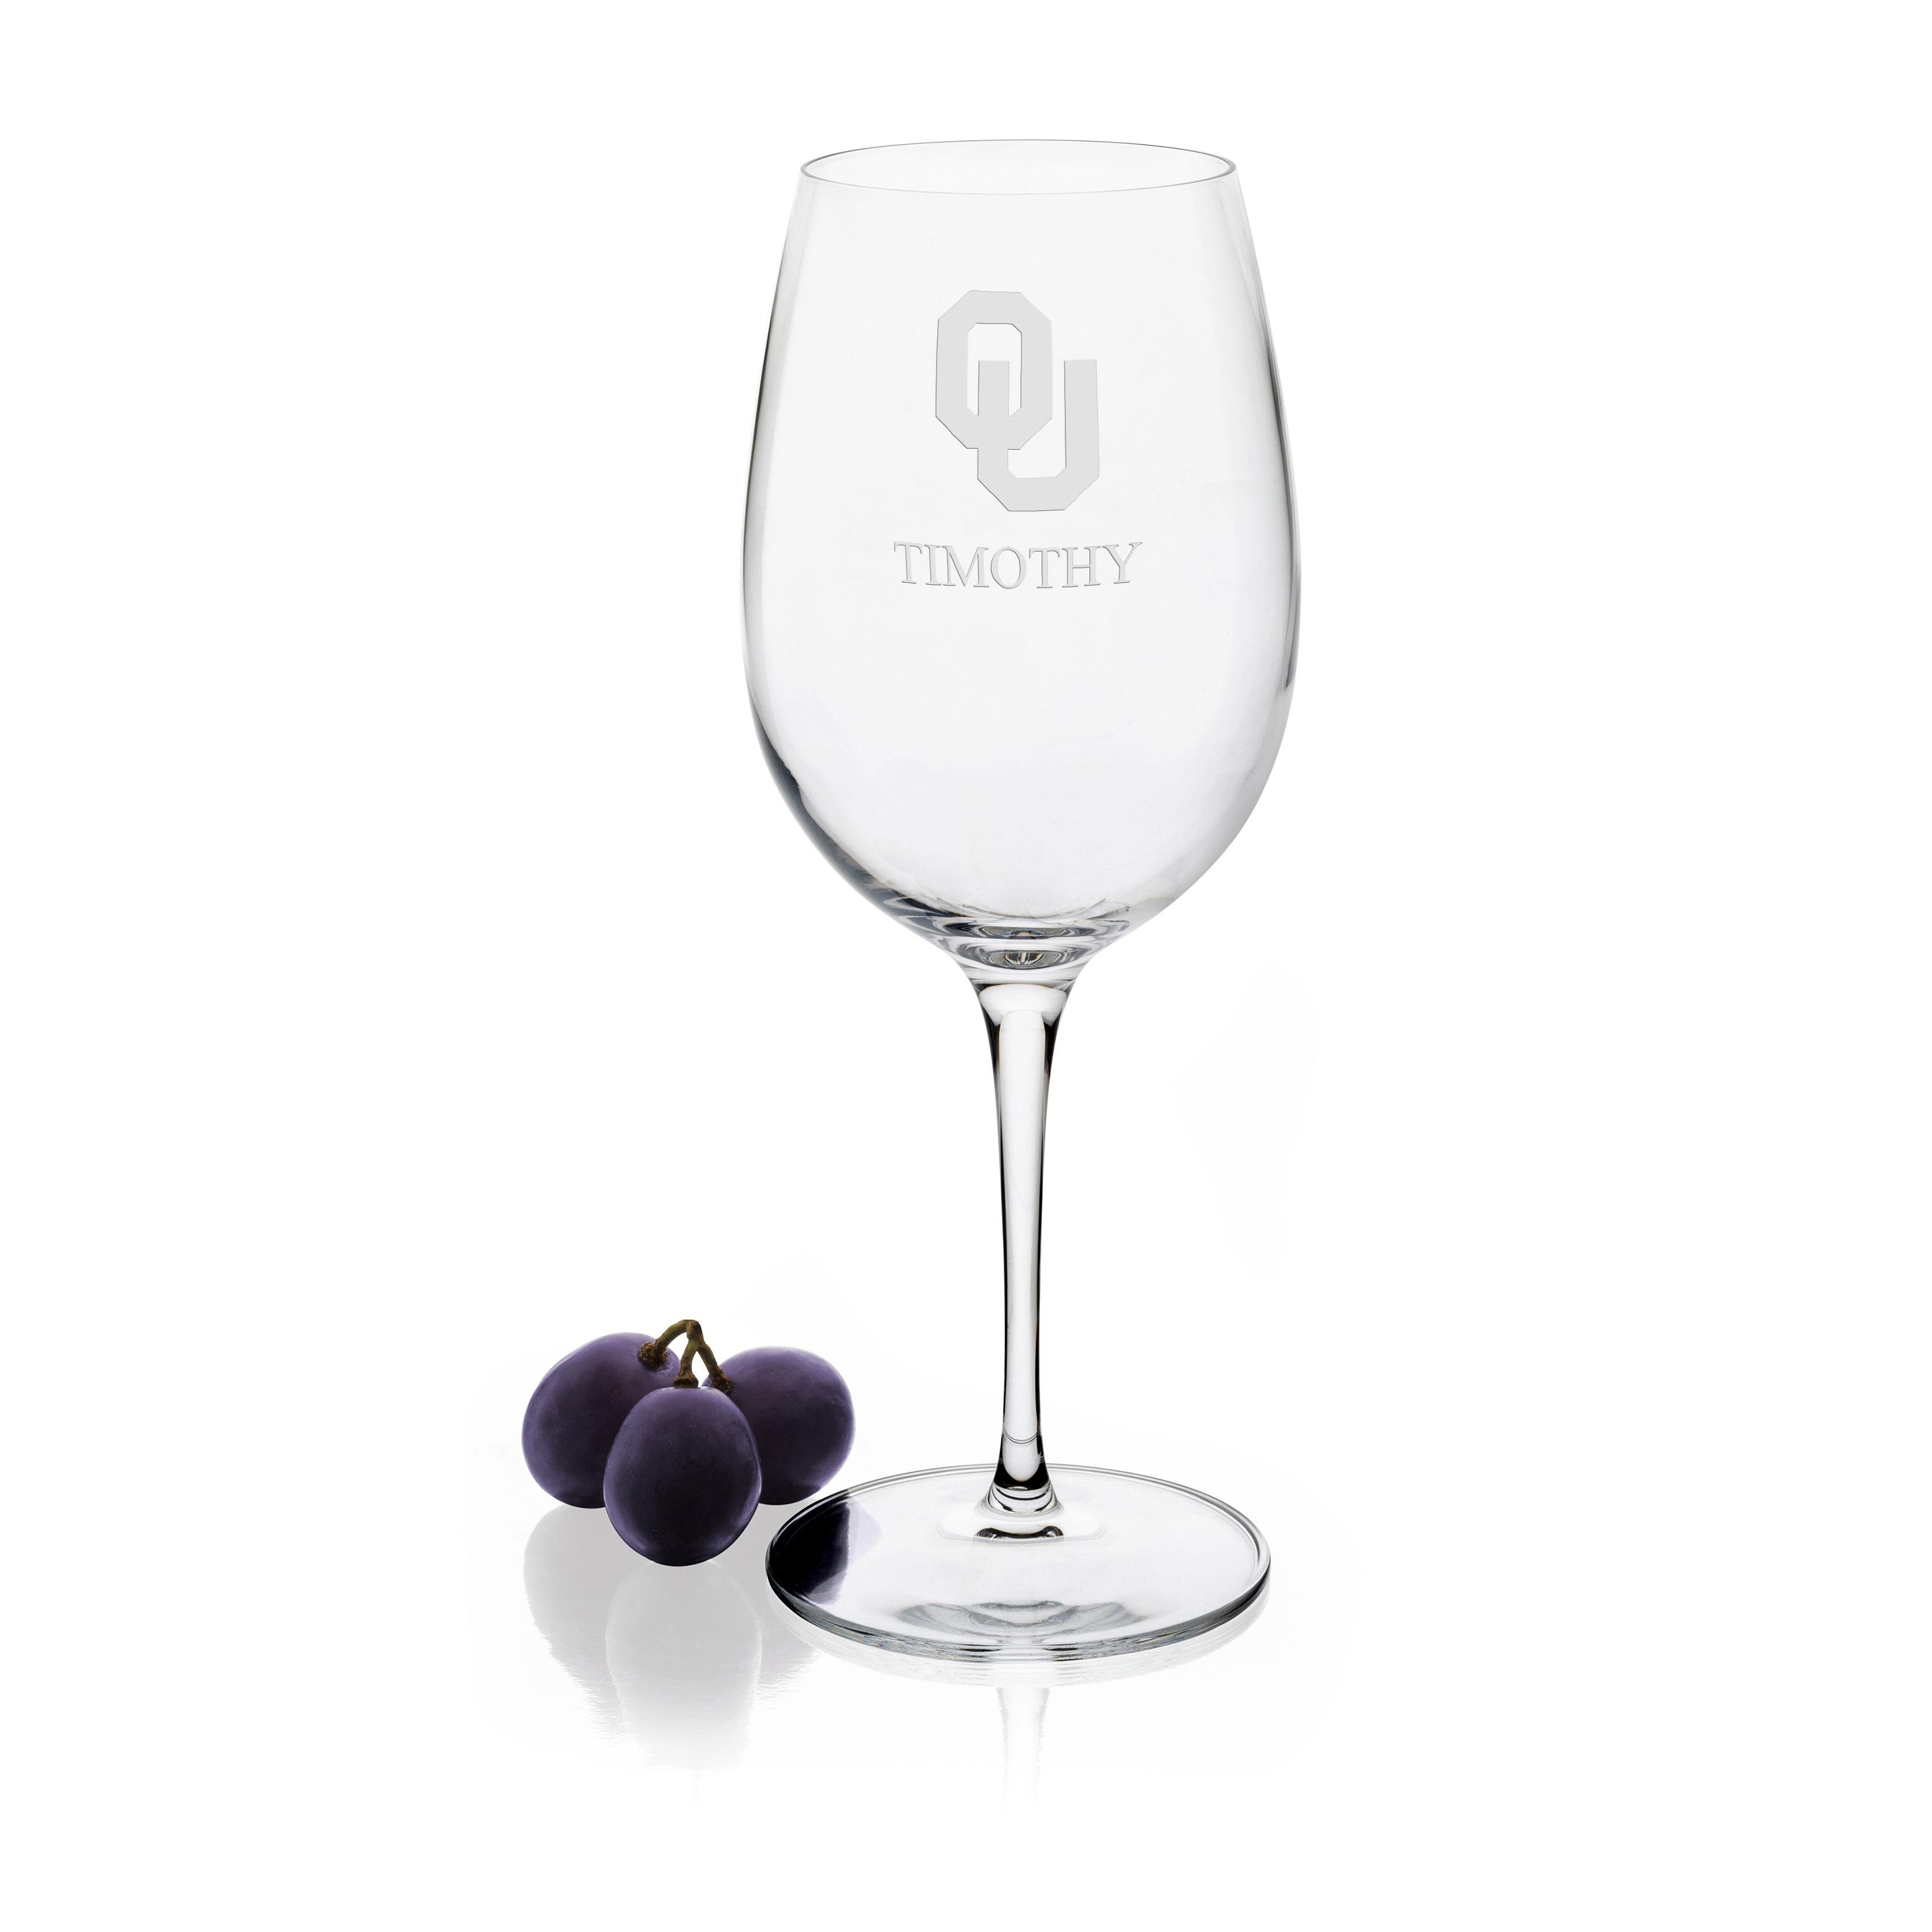 Oklahoma Red Wine Glasses - Set of 4